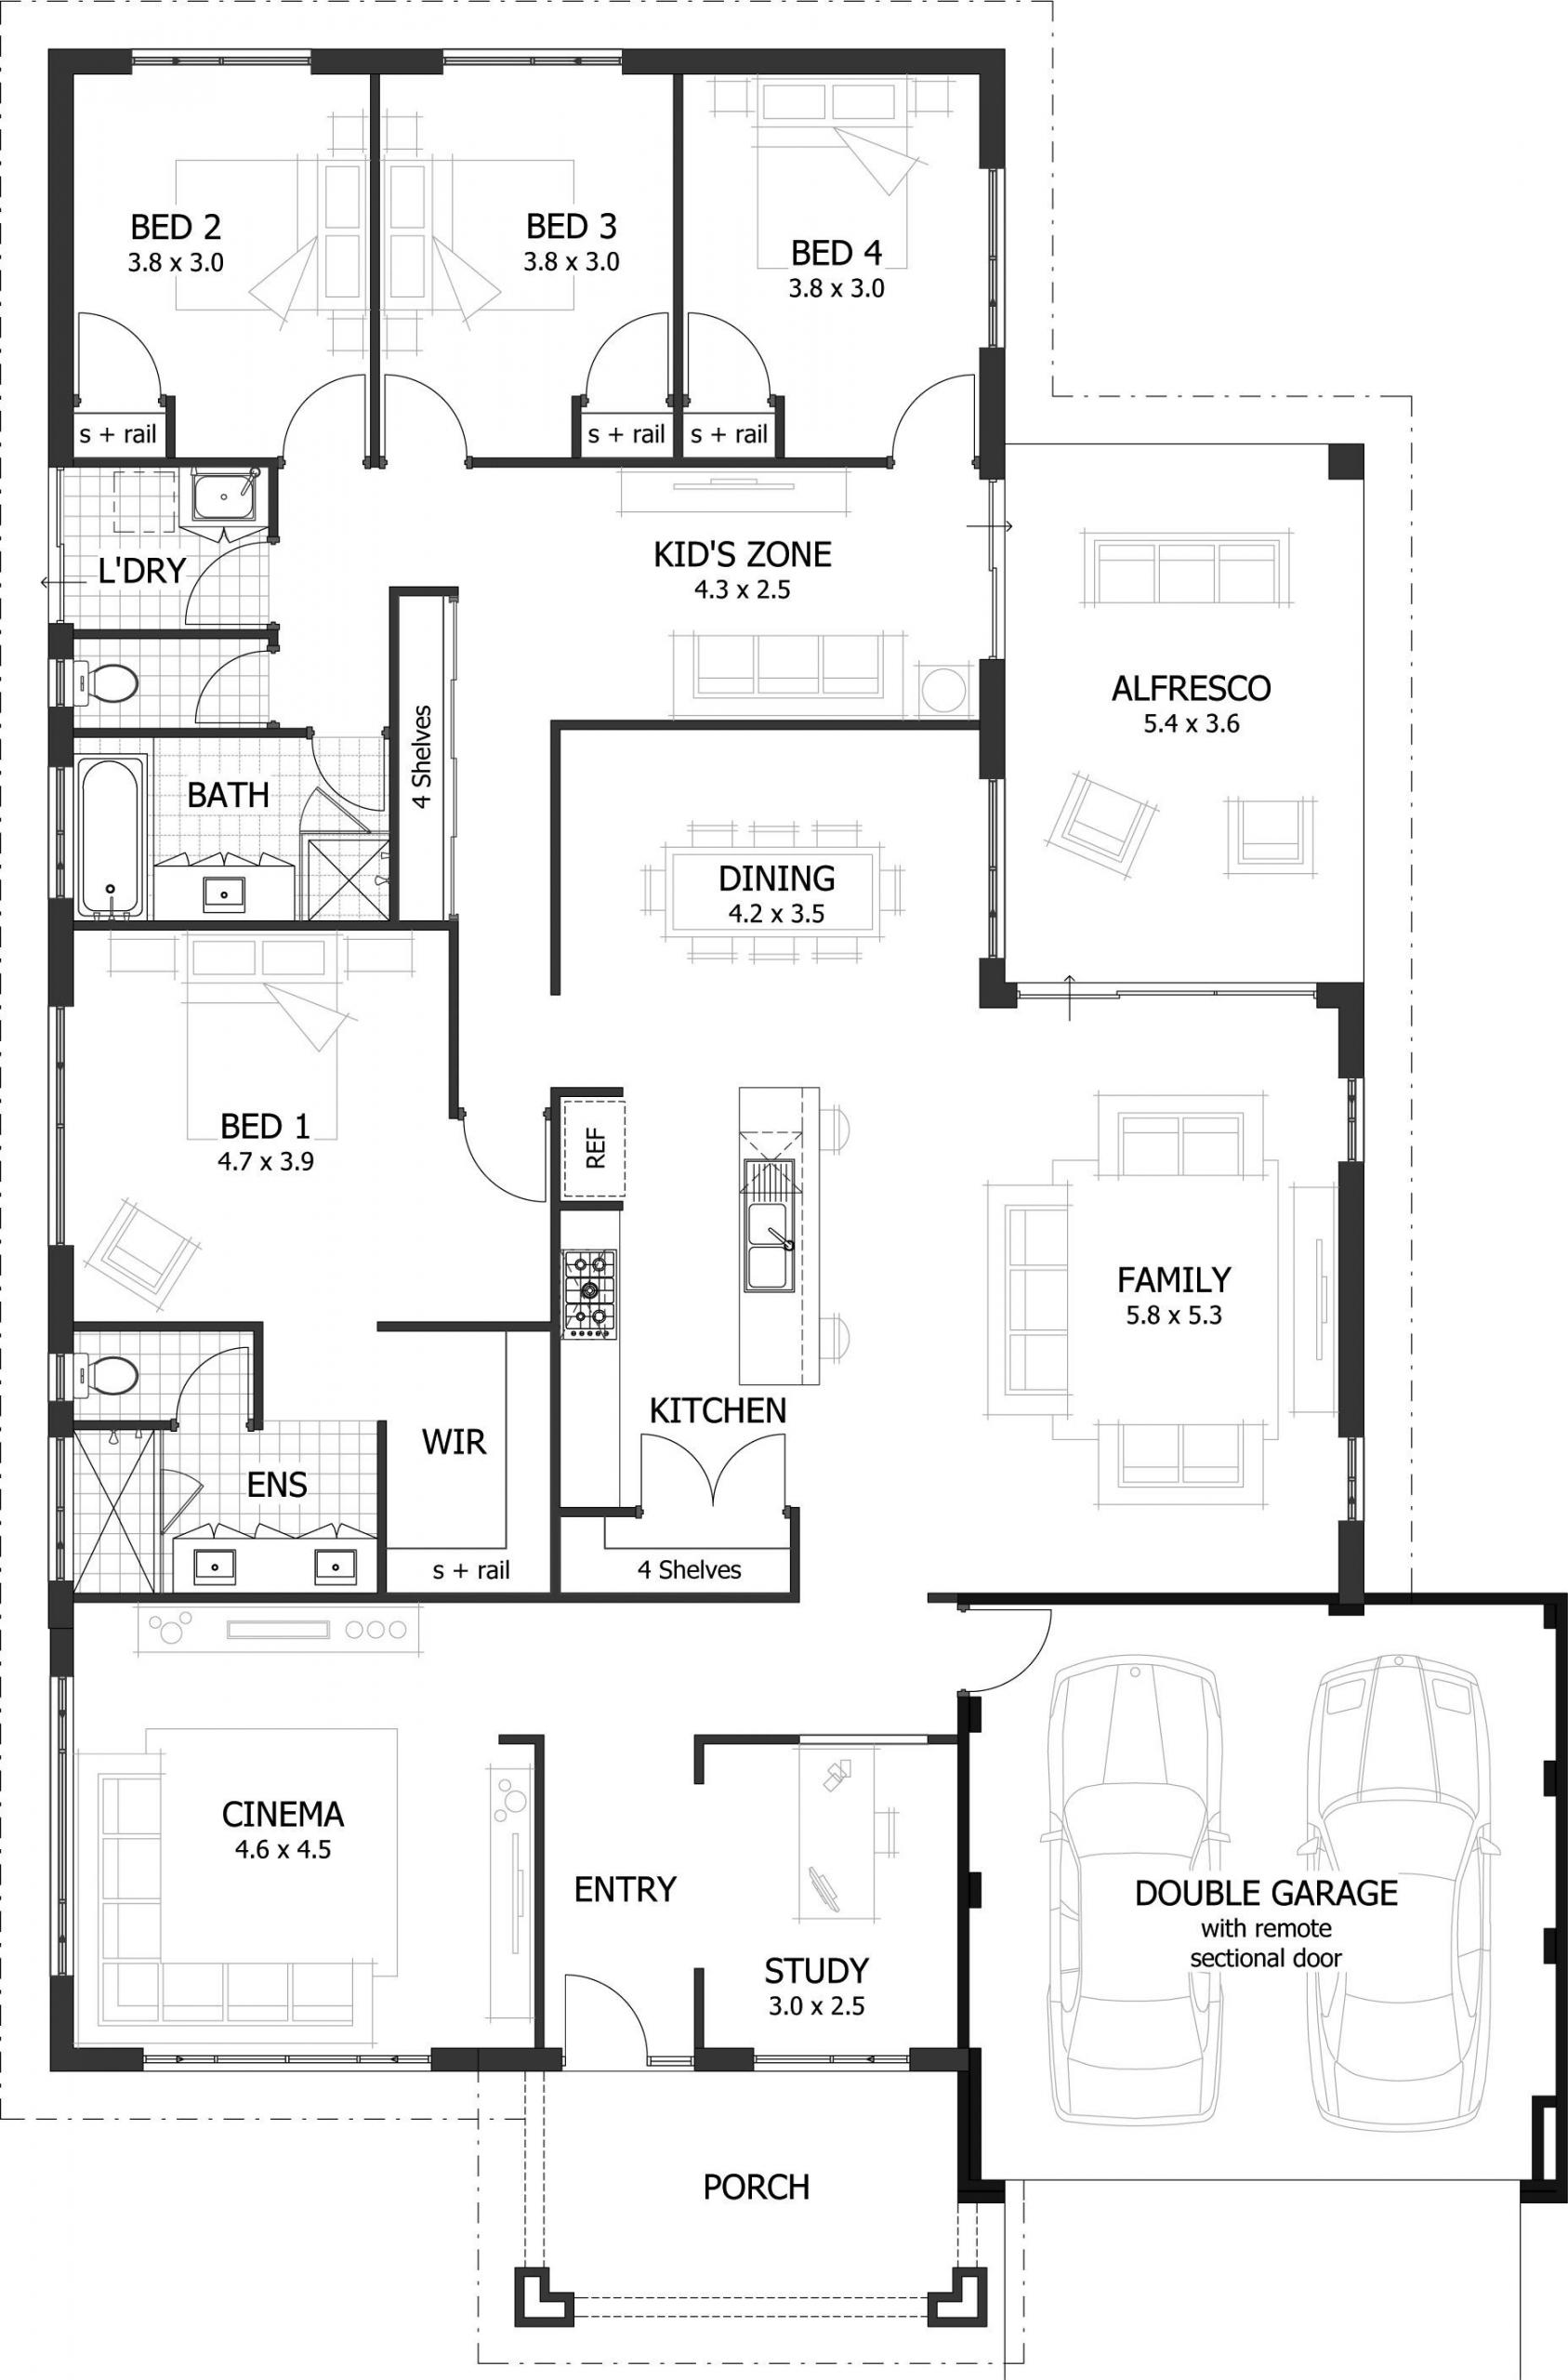 Unique House Design Plans One Floor 4 Bedrooms 4 Bedroom House Plans Home Designs In 2020 Four Bedroom House Plans House Floor Plans 6 Bedroom House Plans